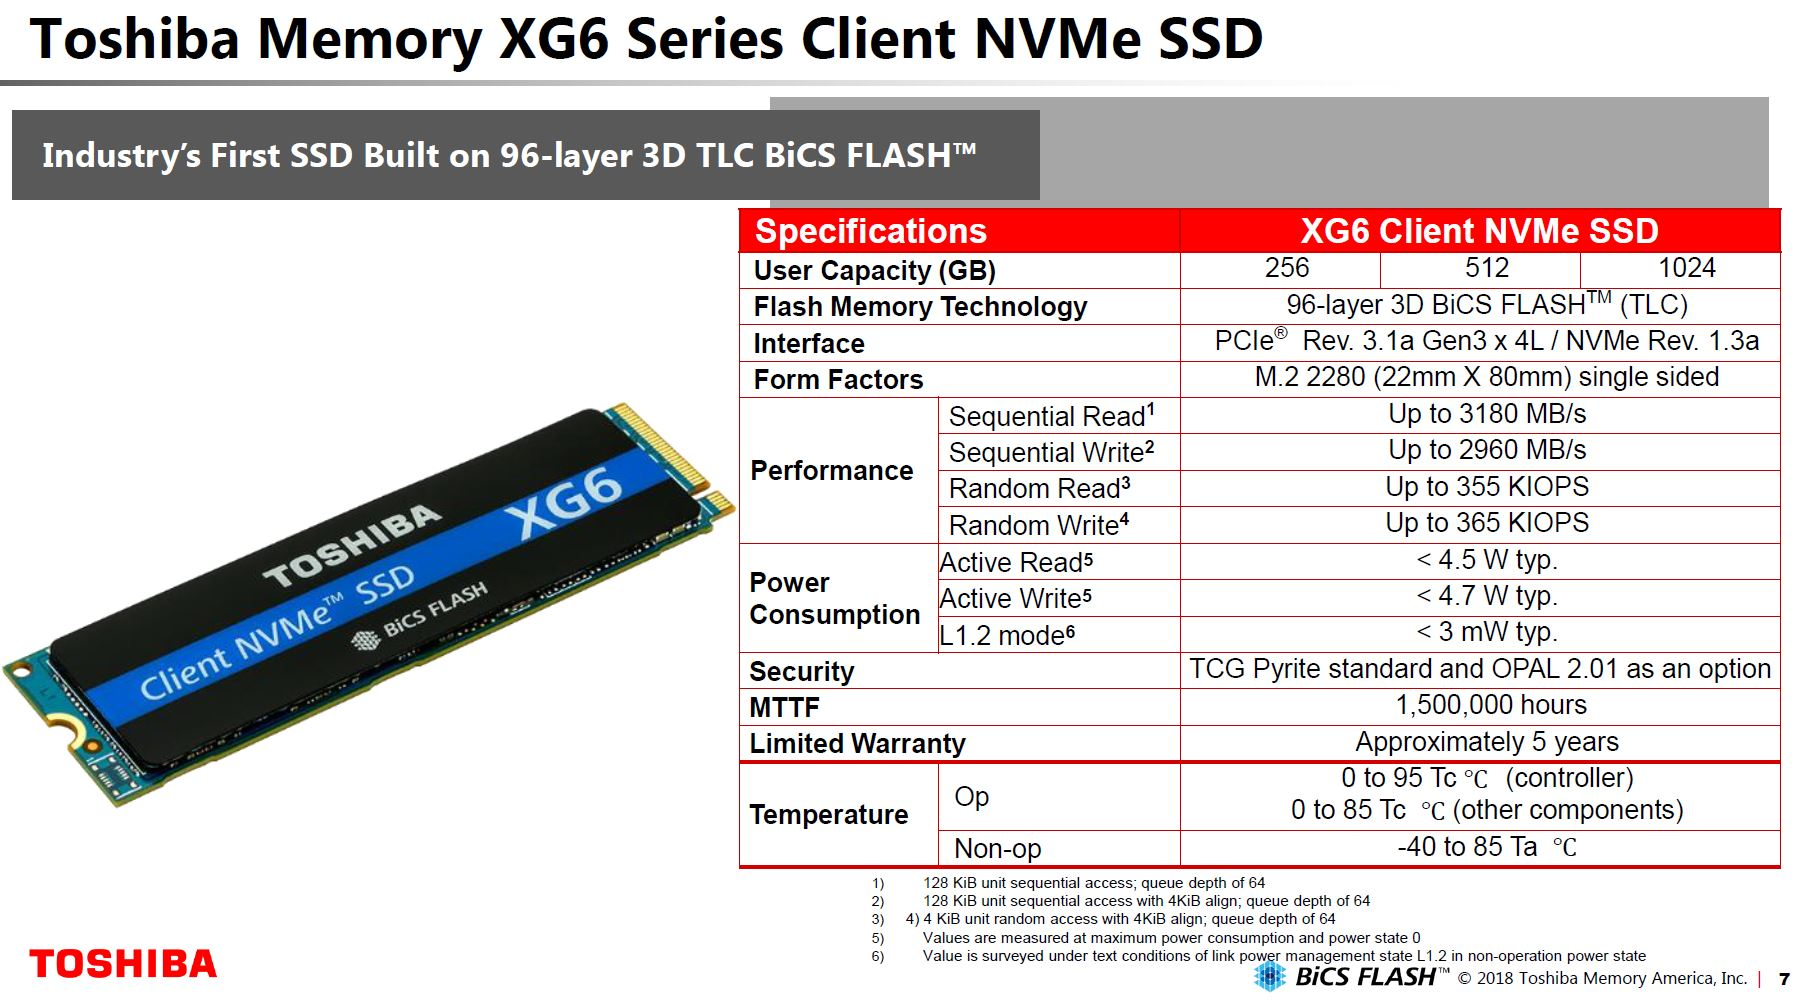 Toshiba XG6 NVMe SSD Specs